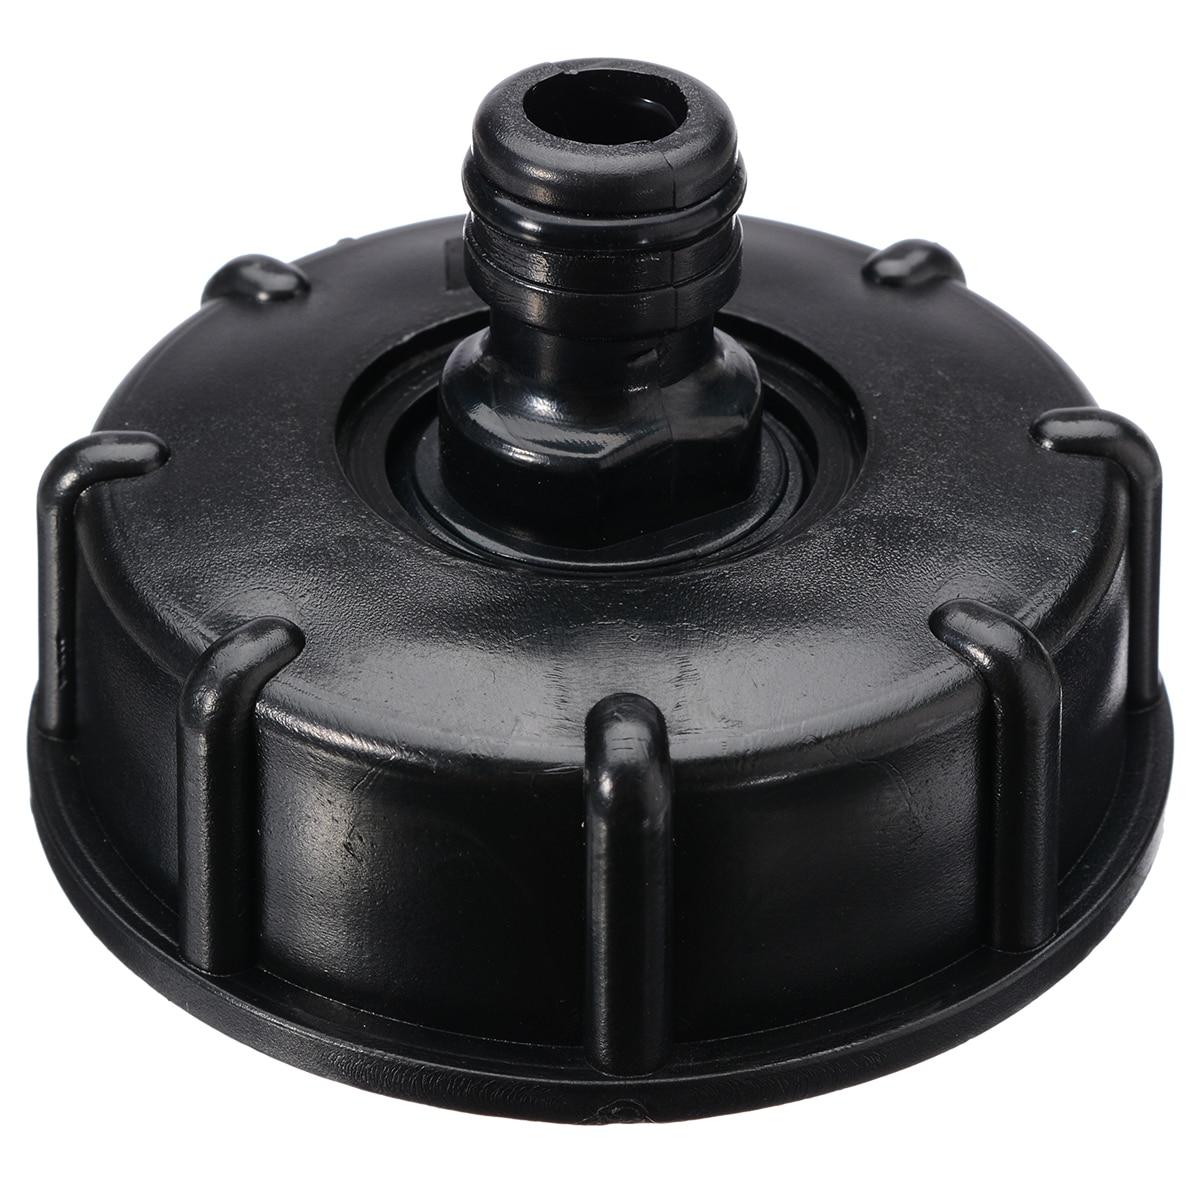 Mayitr IBC contenedor S60 X6 adaptador jardín grifo conexión manguera reemplazo válvula conectores